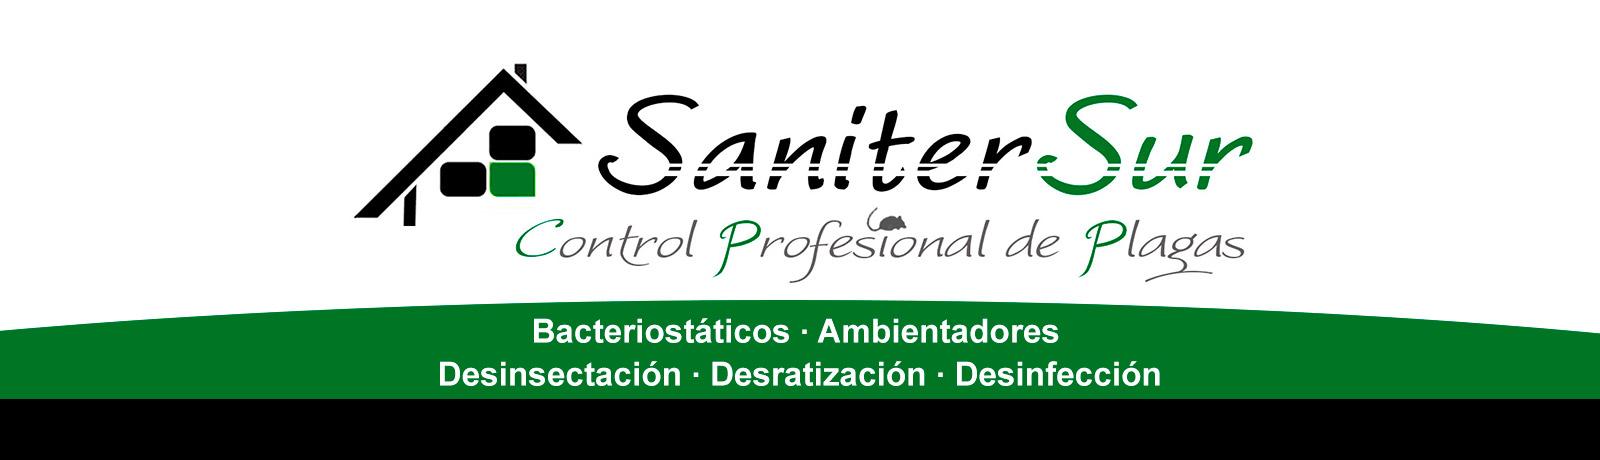 Sanitersur - Control de Plagas en Jaen